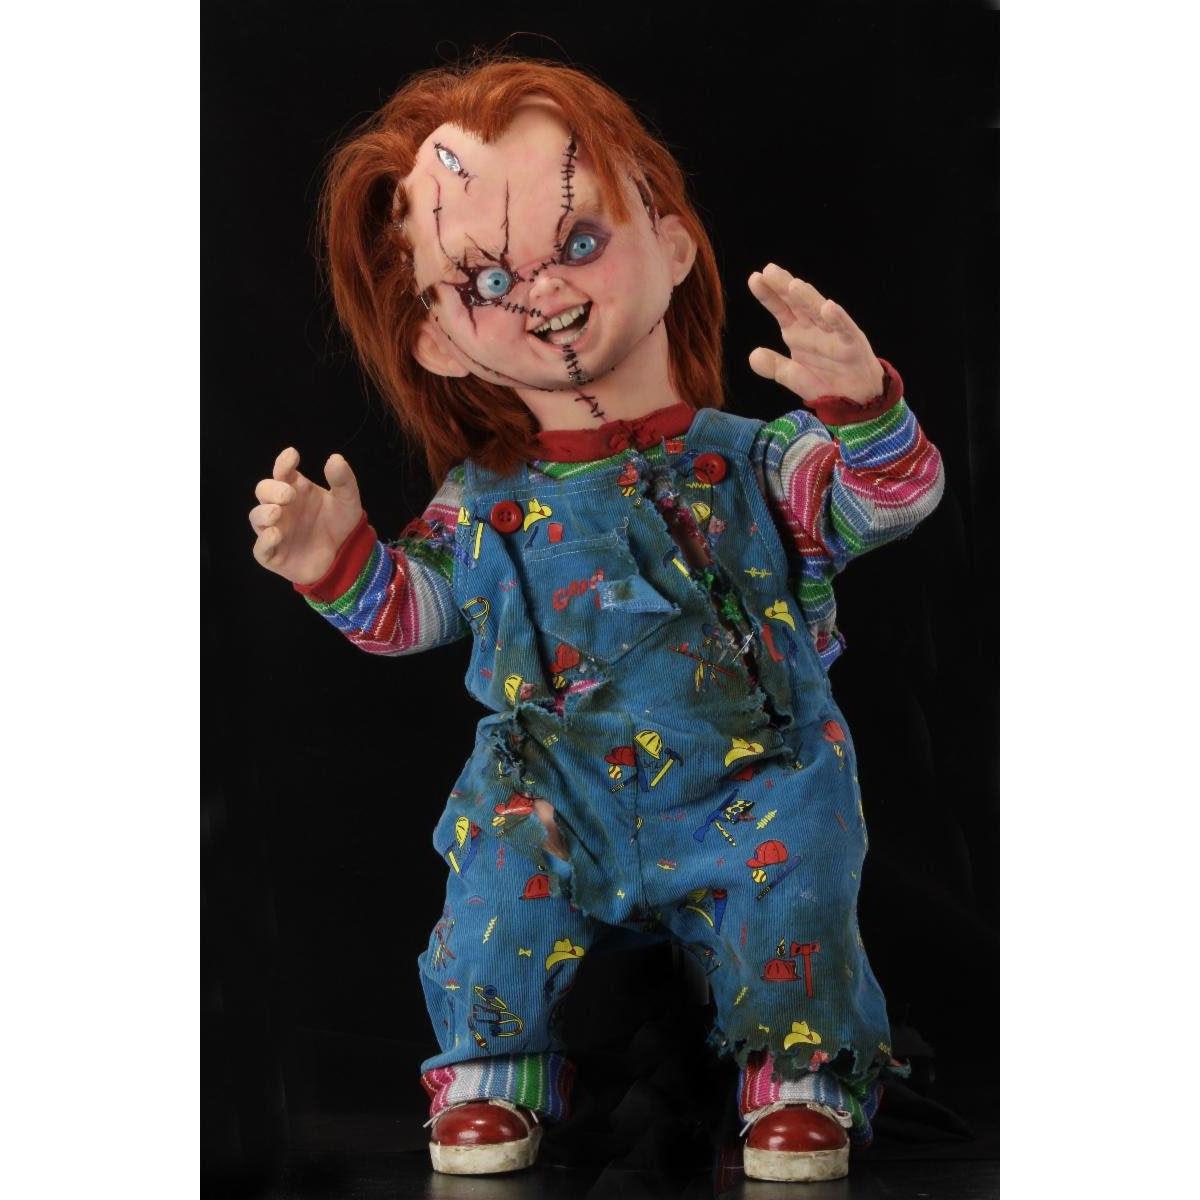 Image of Bride of Chucky - 1:1 Replica - Life-Size Chucky - FEBRUARY 2020